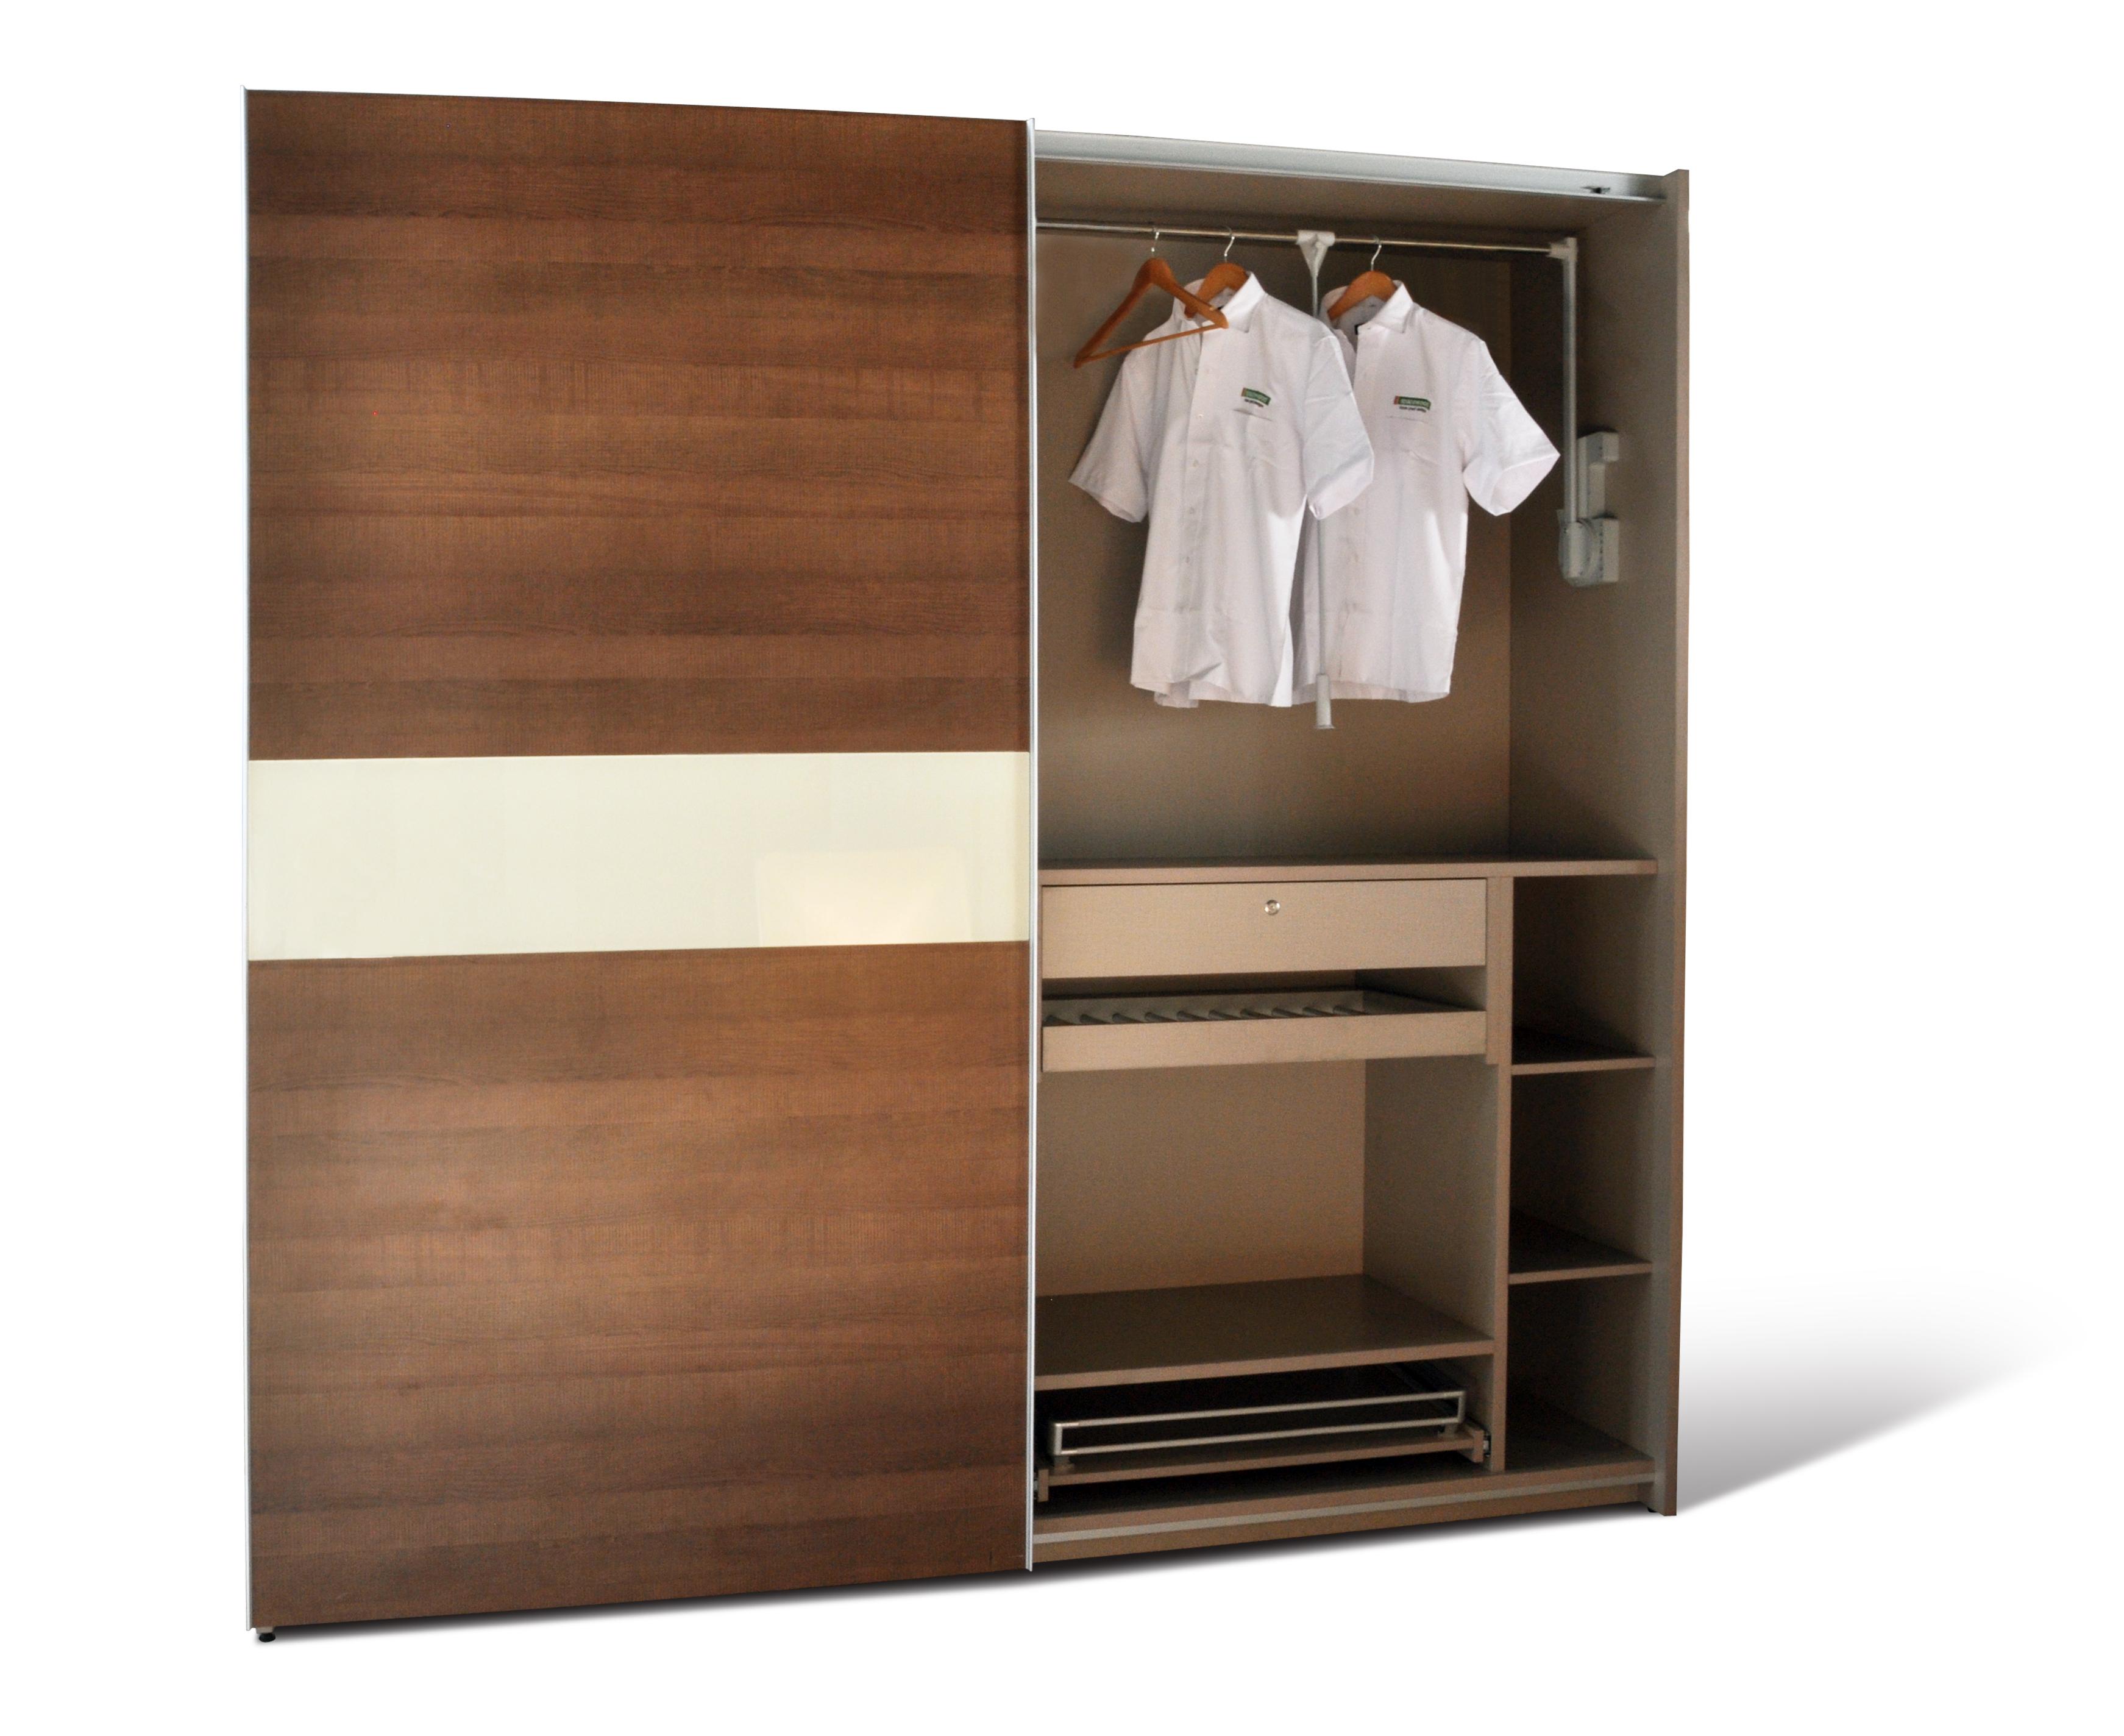 Spacewood sliding for Kitchen wardrobe